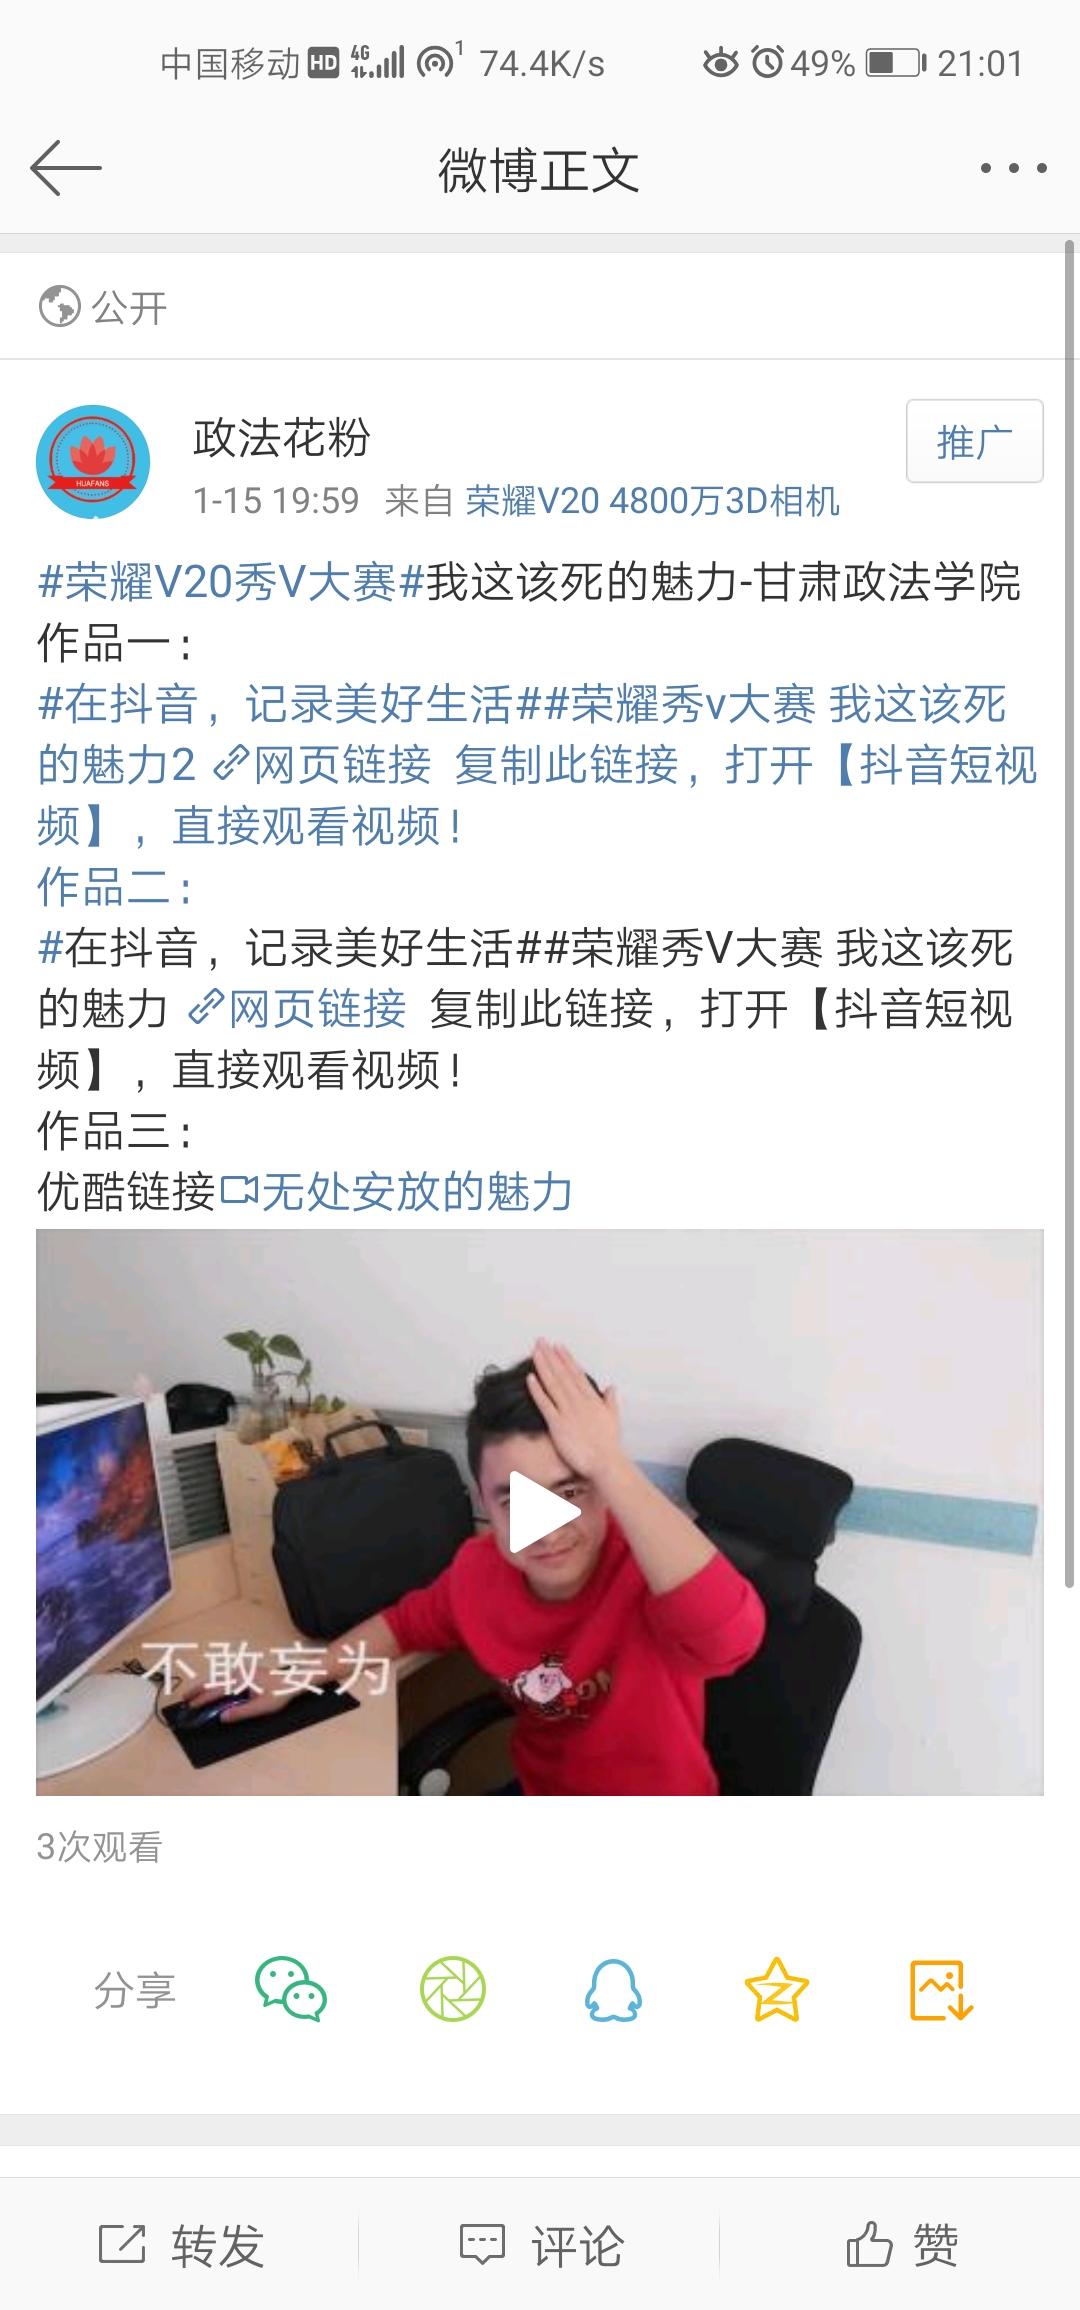 Screenshot_20190210_210143_com.sina.weibo.jpg